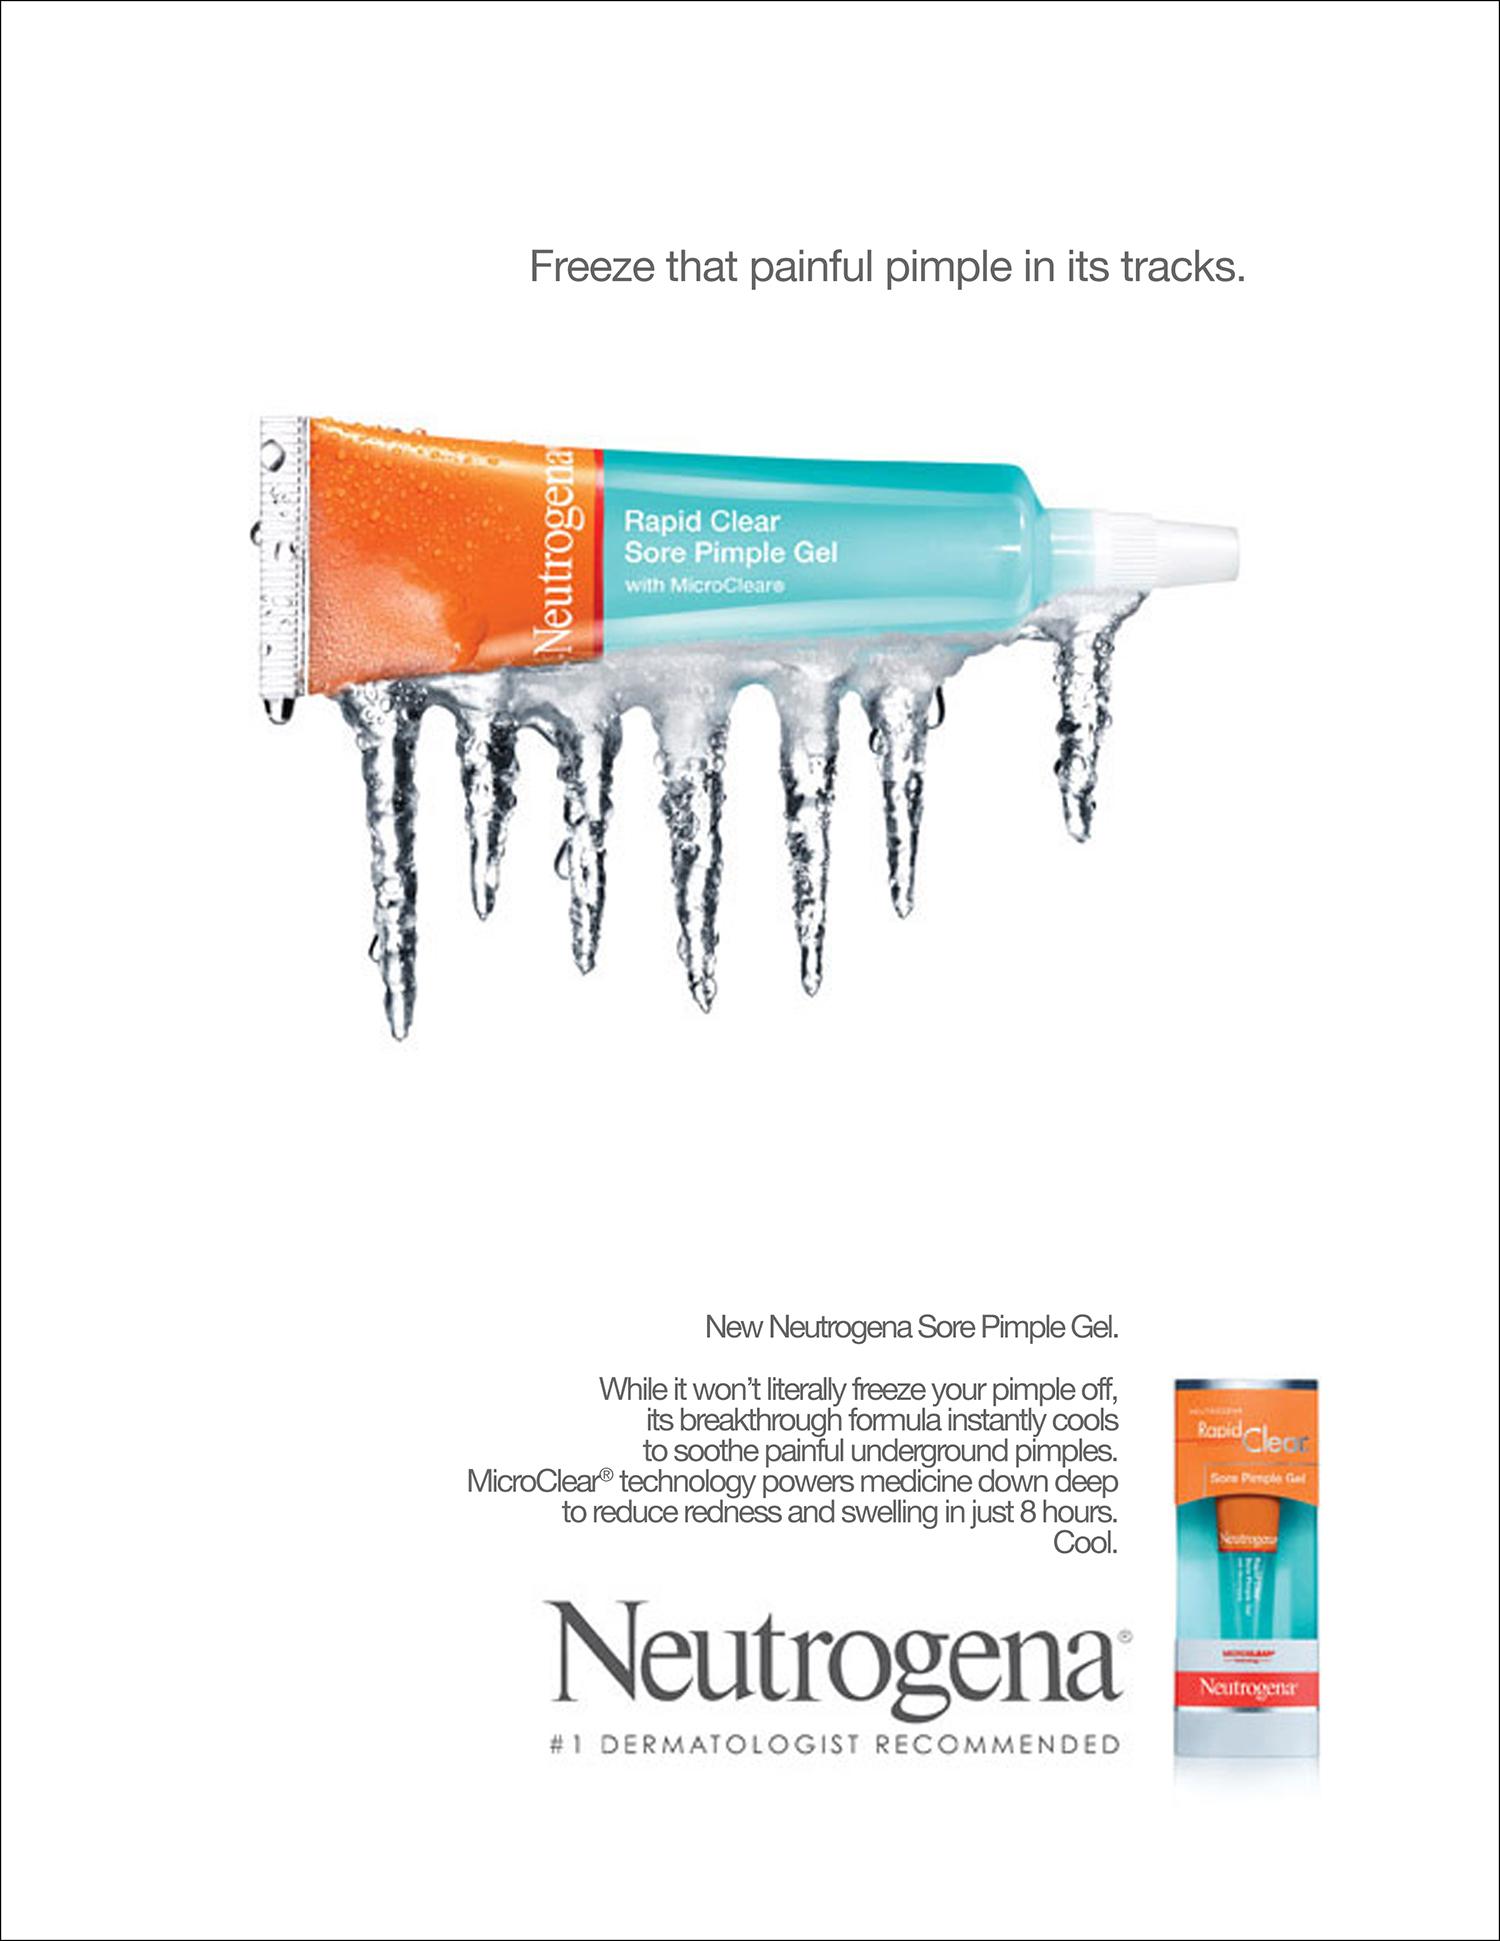 Neutrogena (Freeze)